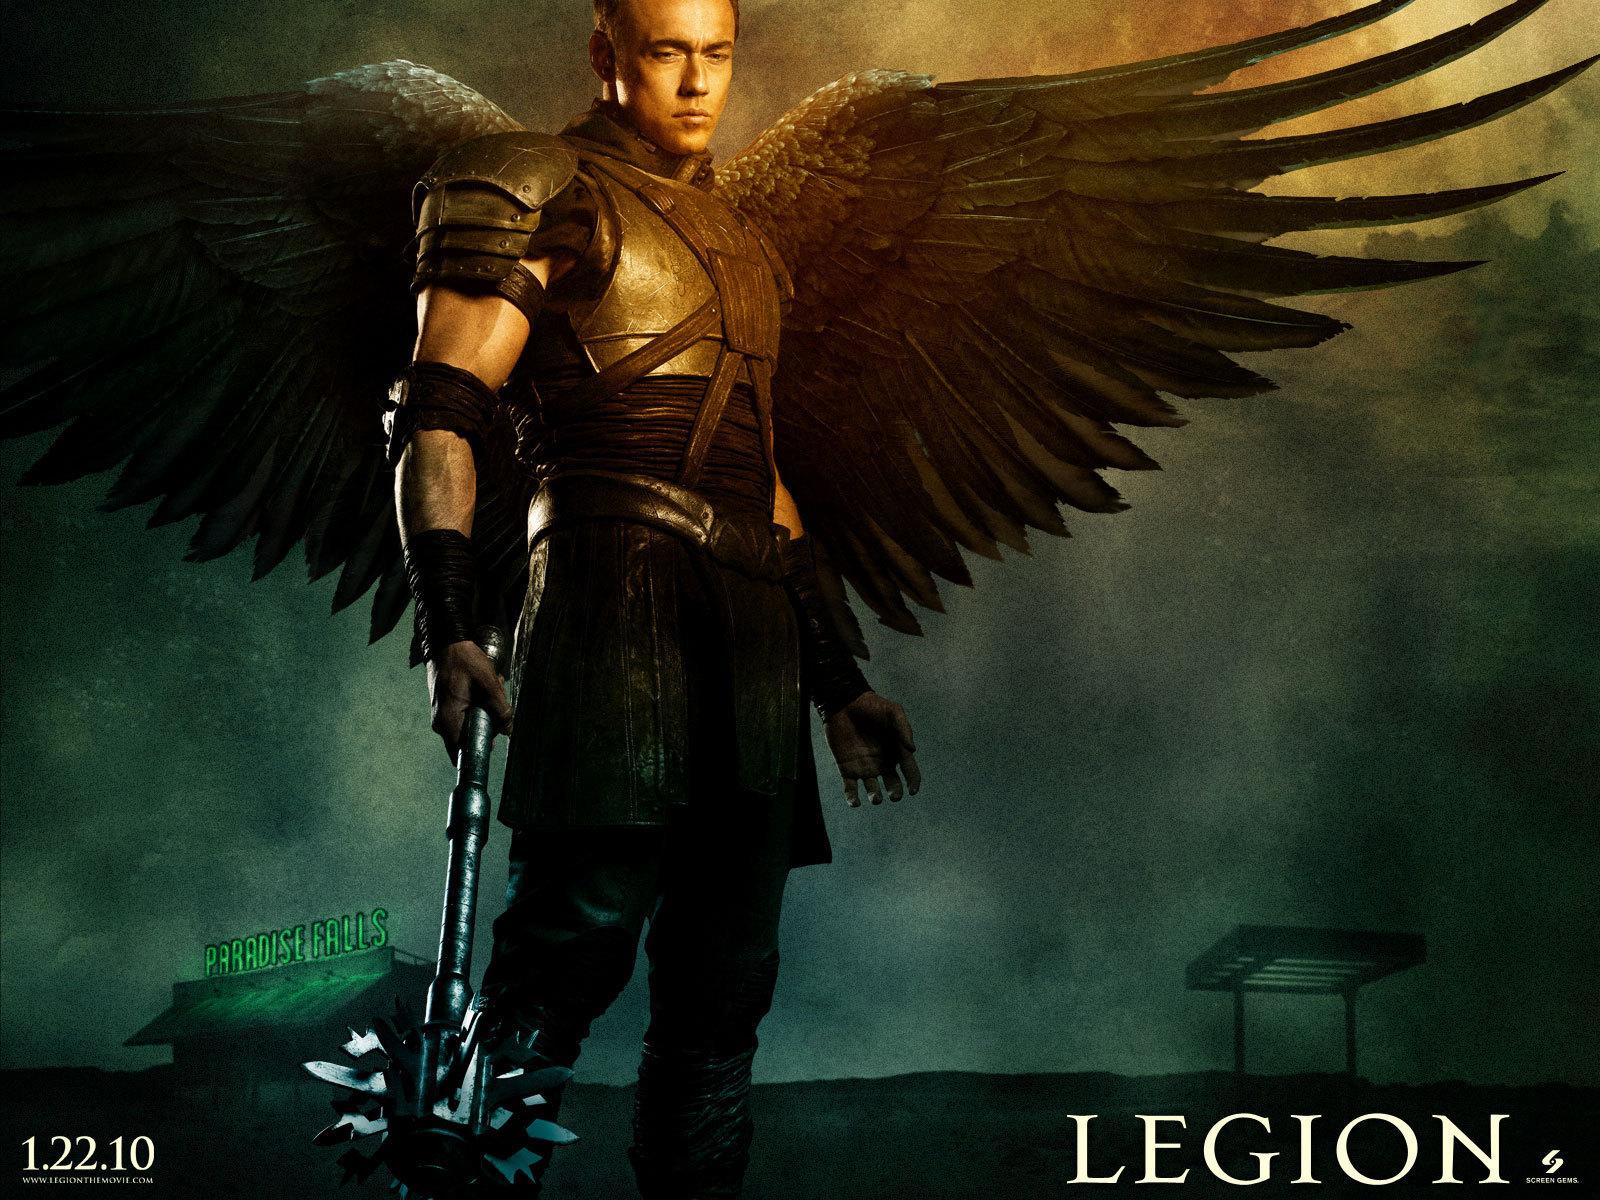 Good Legion Wallpaper - Gavriil-legion-10531075-1600-1200  Best Photo Reference_4666100.jpg